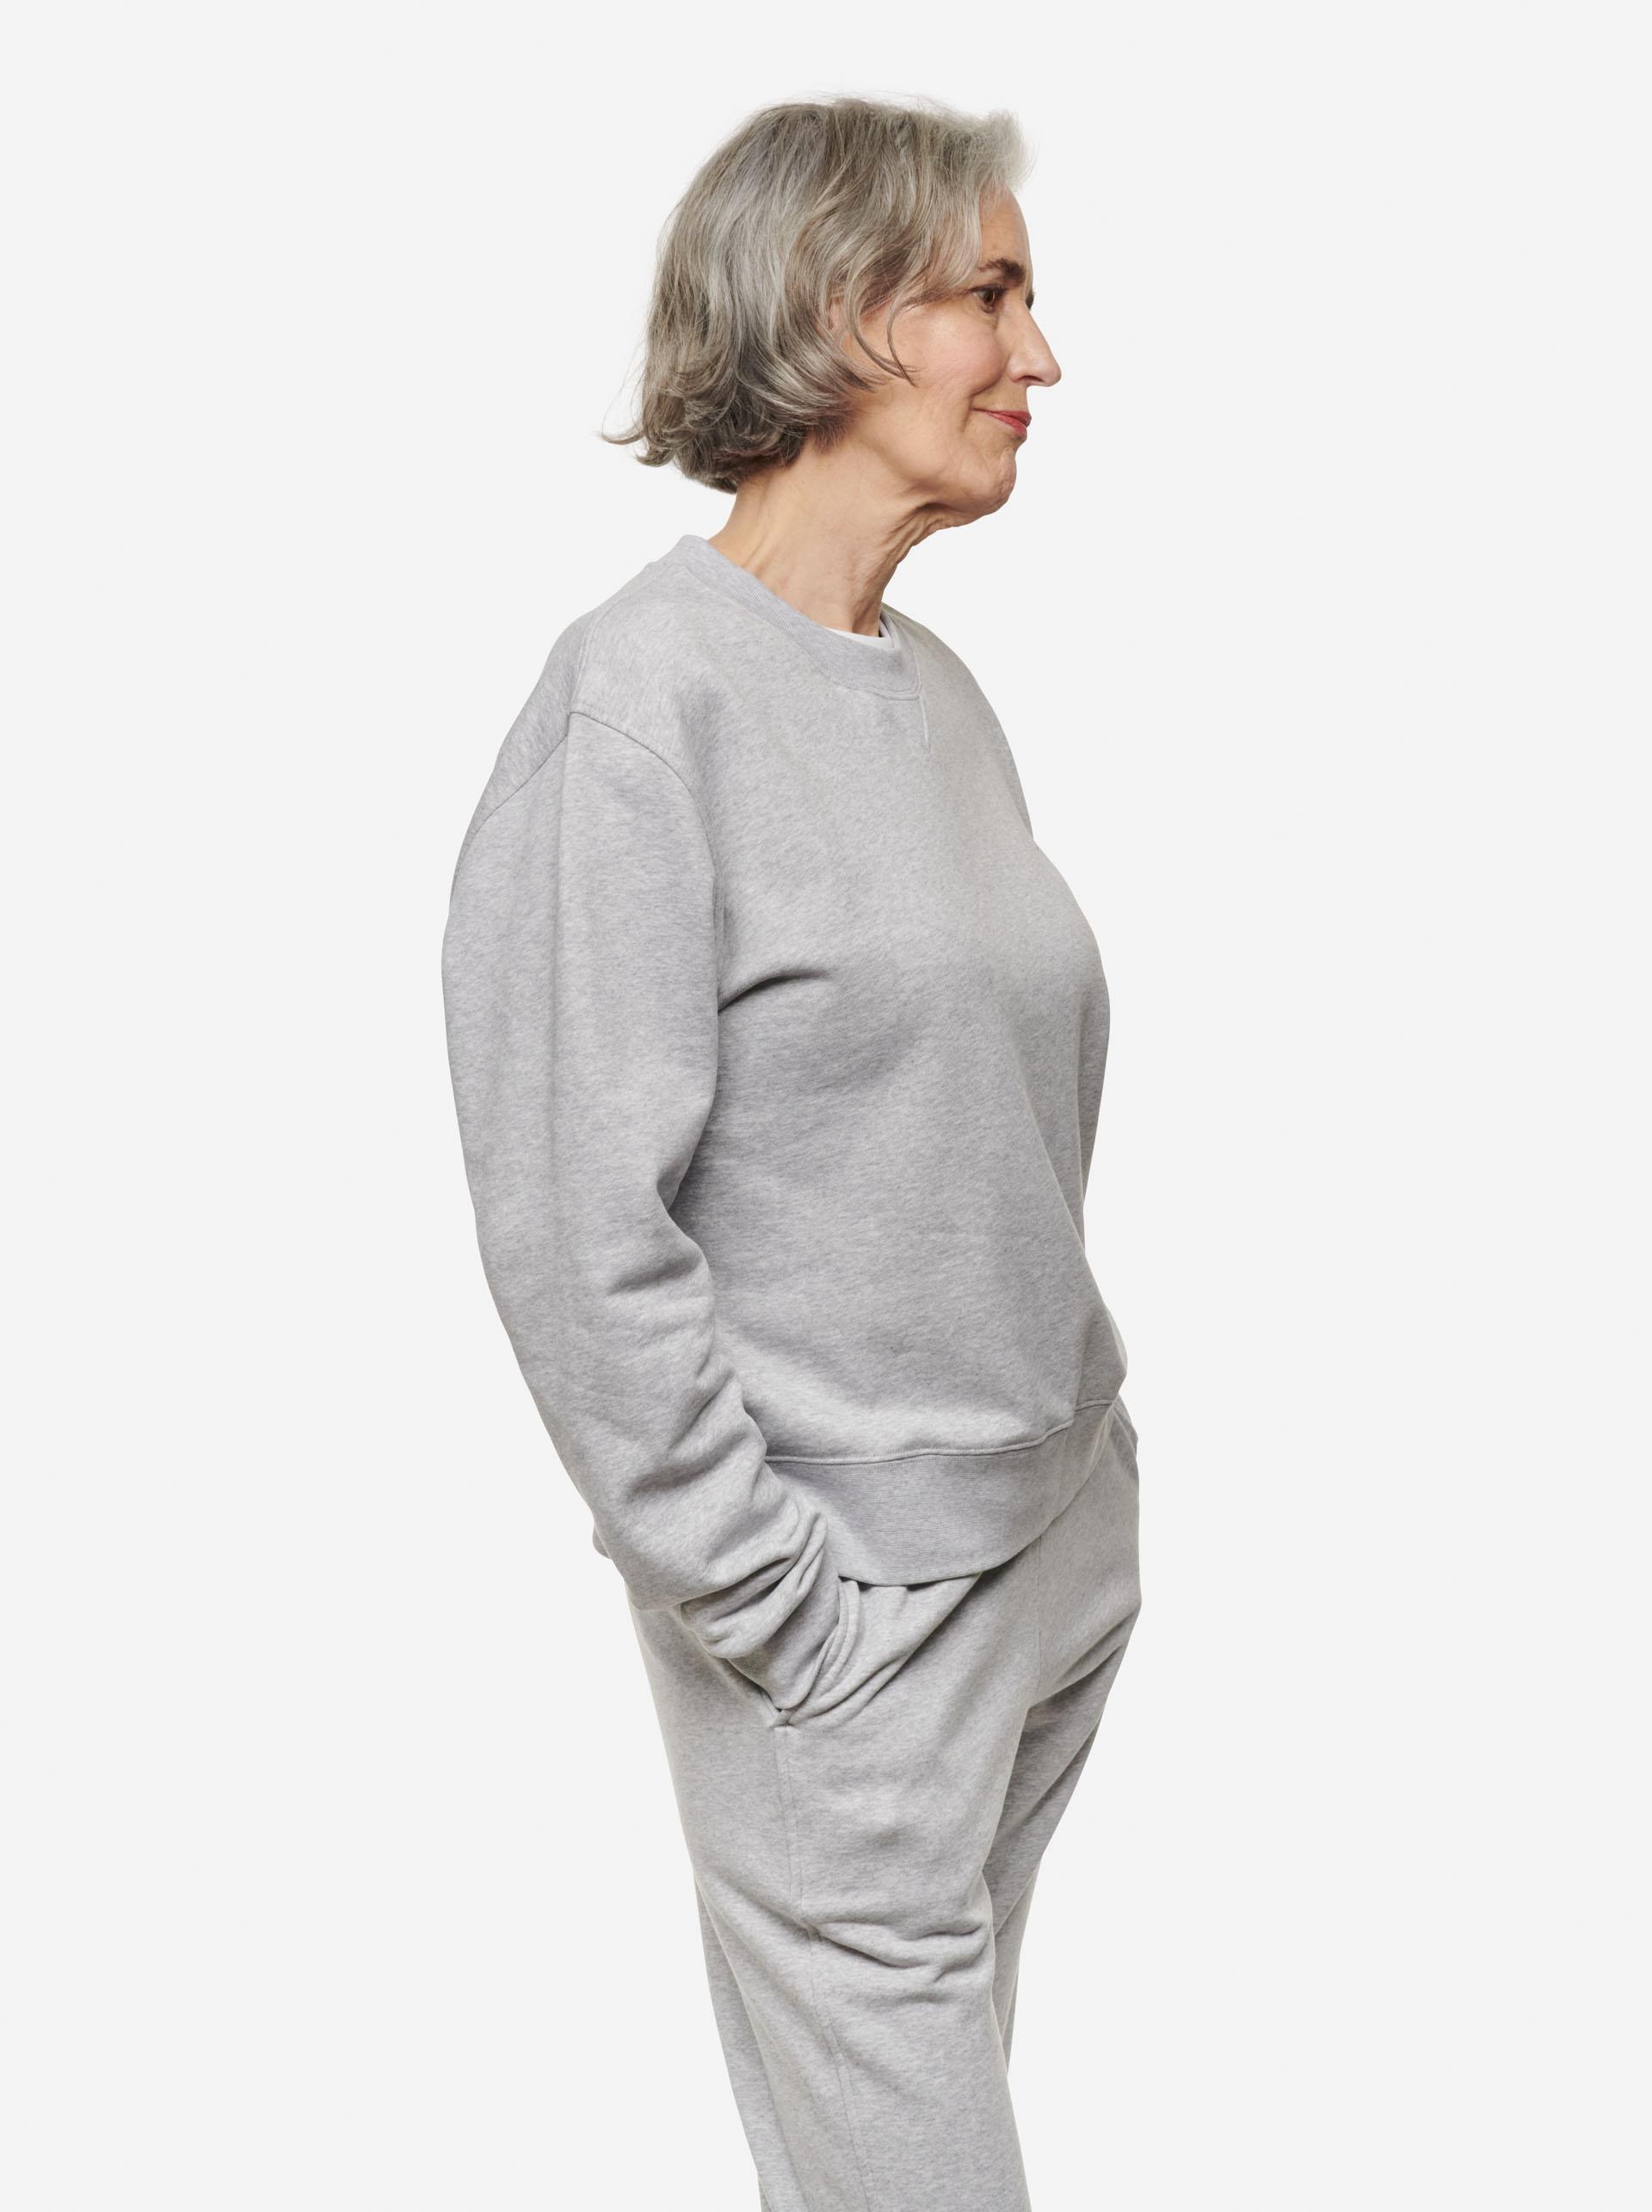 Teym - The Sweatshirt - Women - Grey - 2